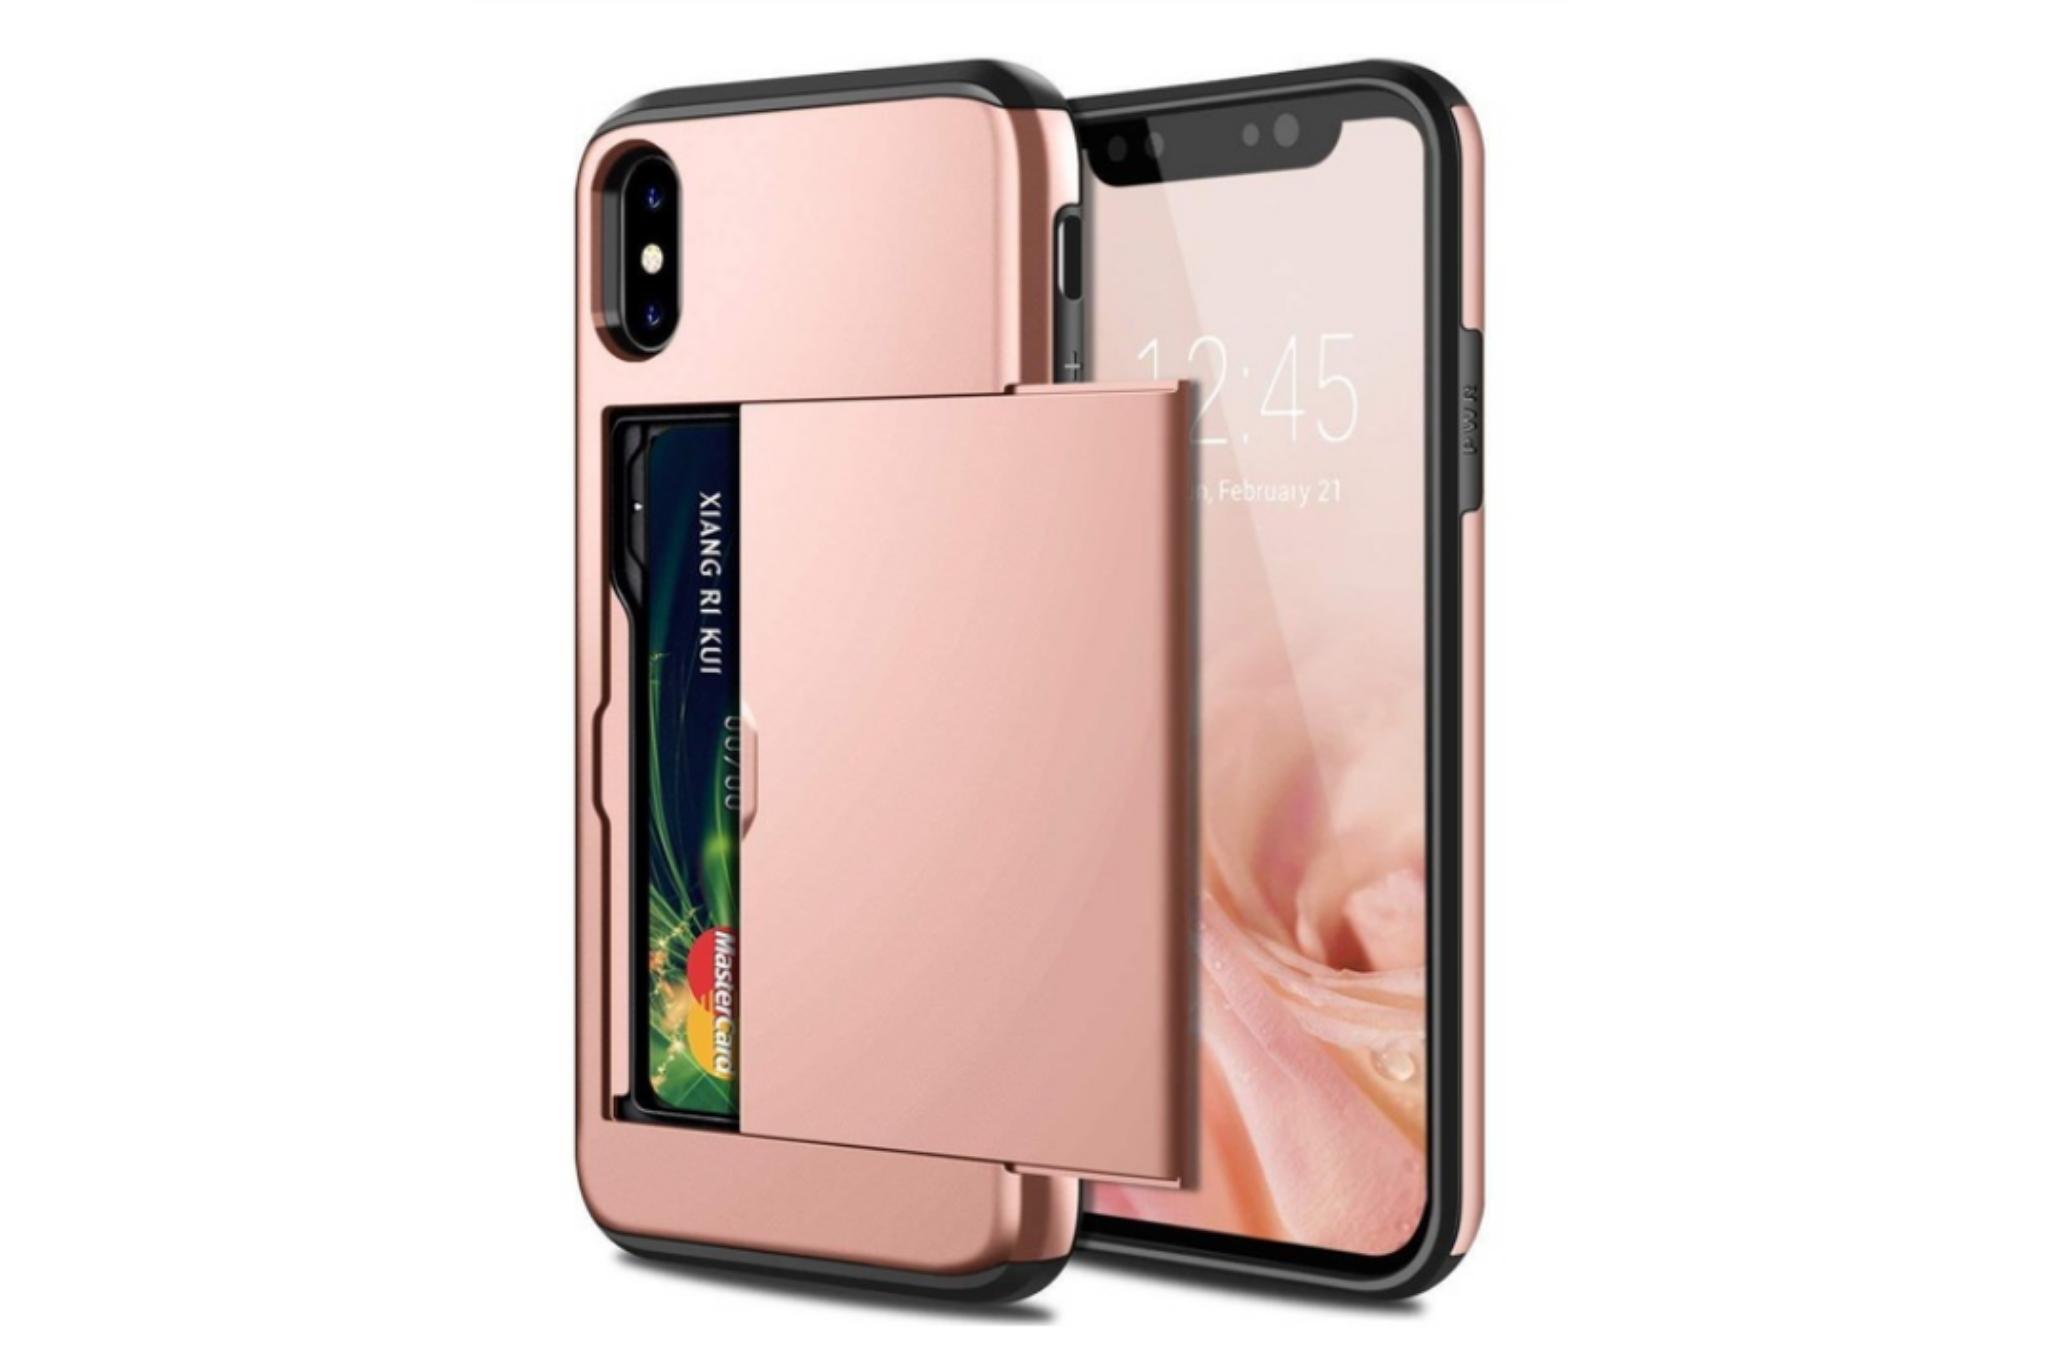 Smartphonehoesje iPhone 7 plus / 8 plus | Pasjesschuif rosegold